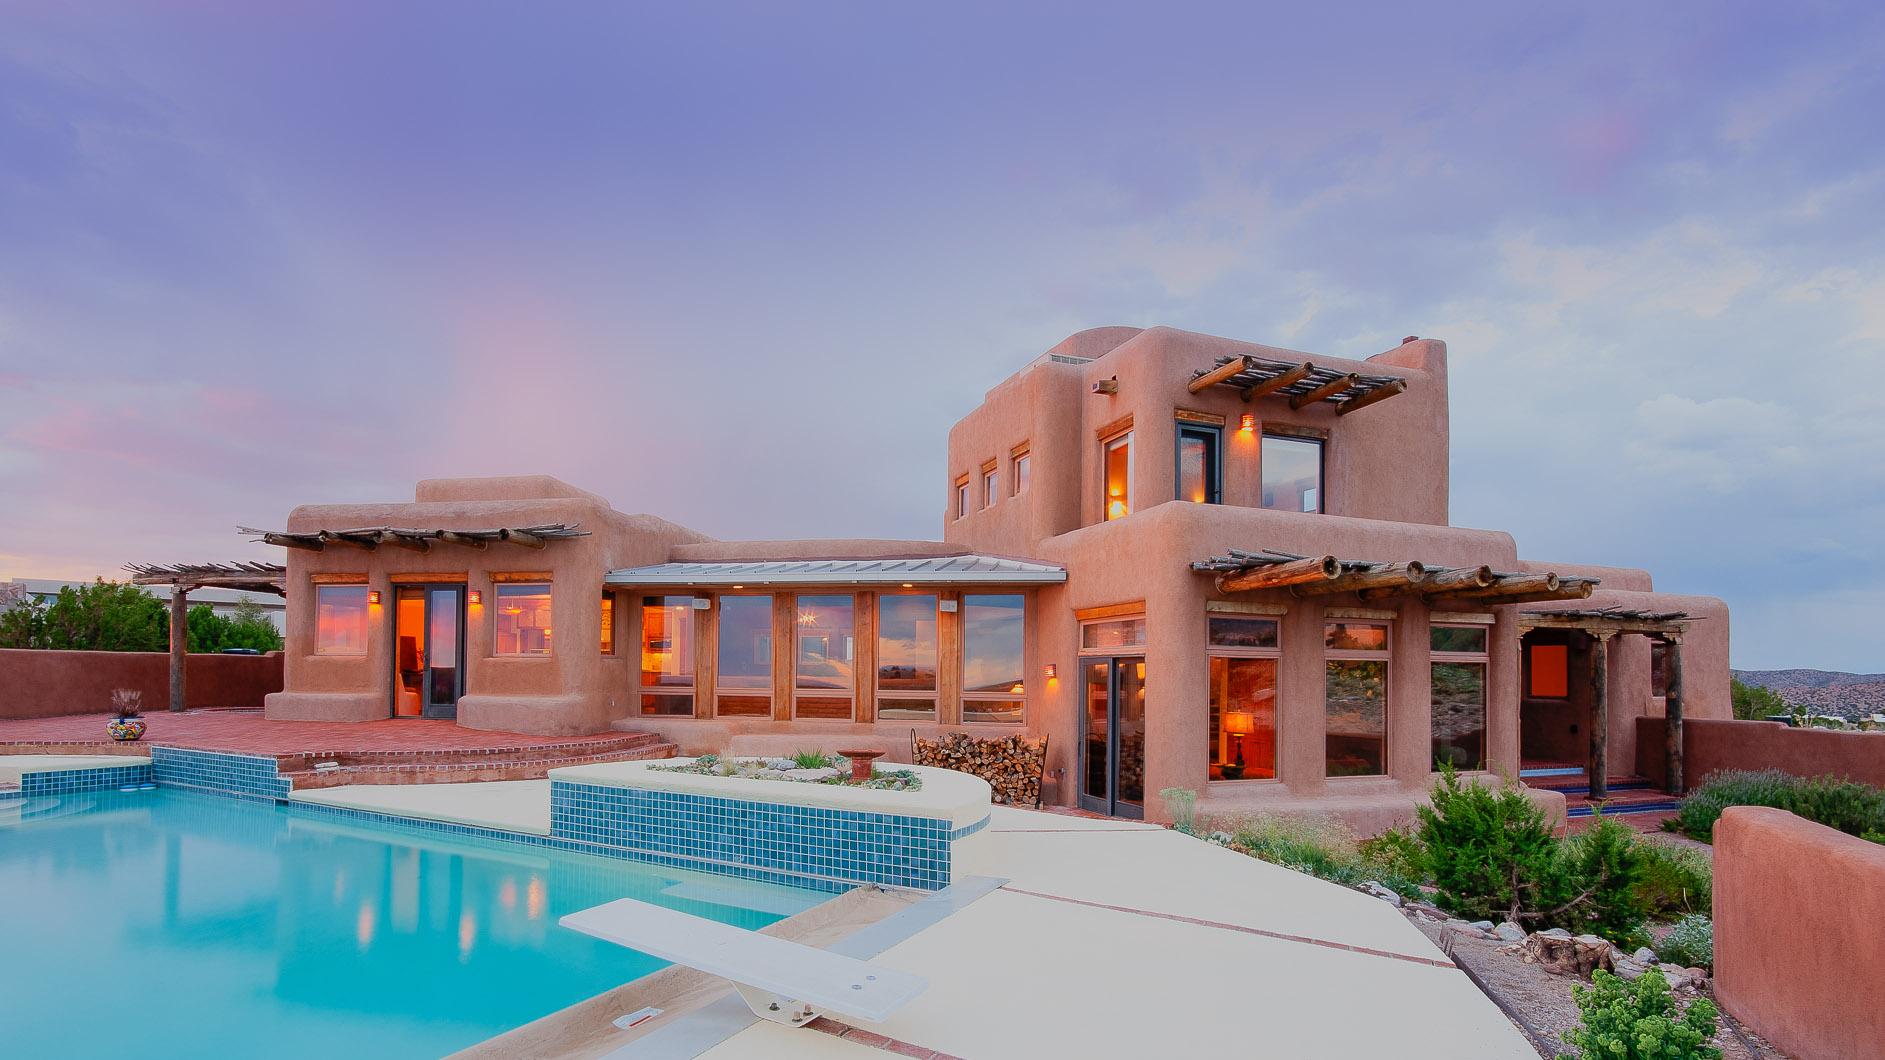 Albuquerque Real Estate Homes For Sale